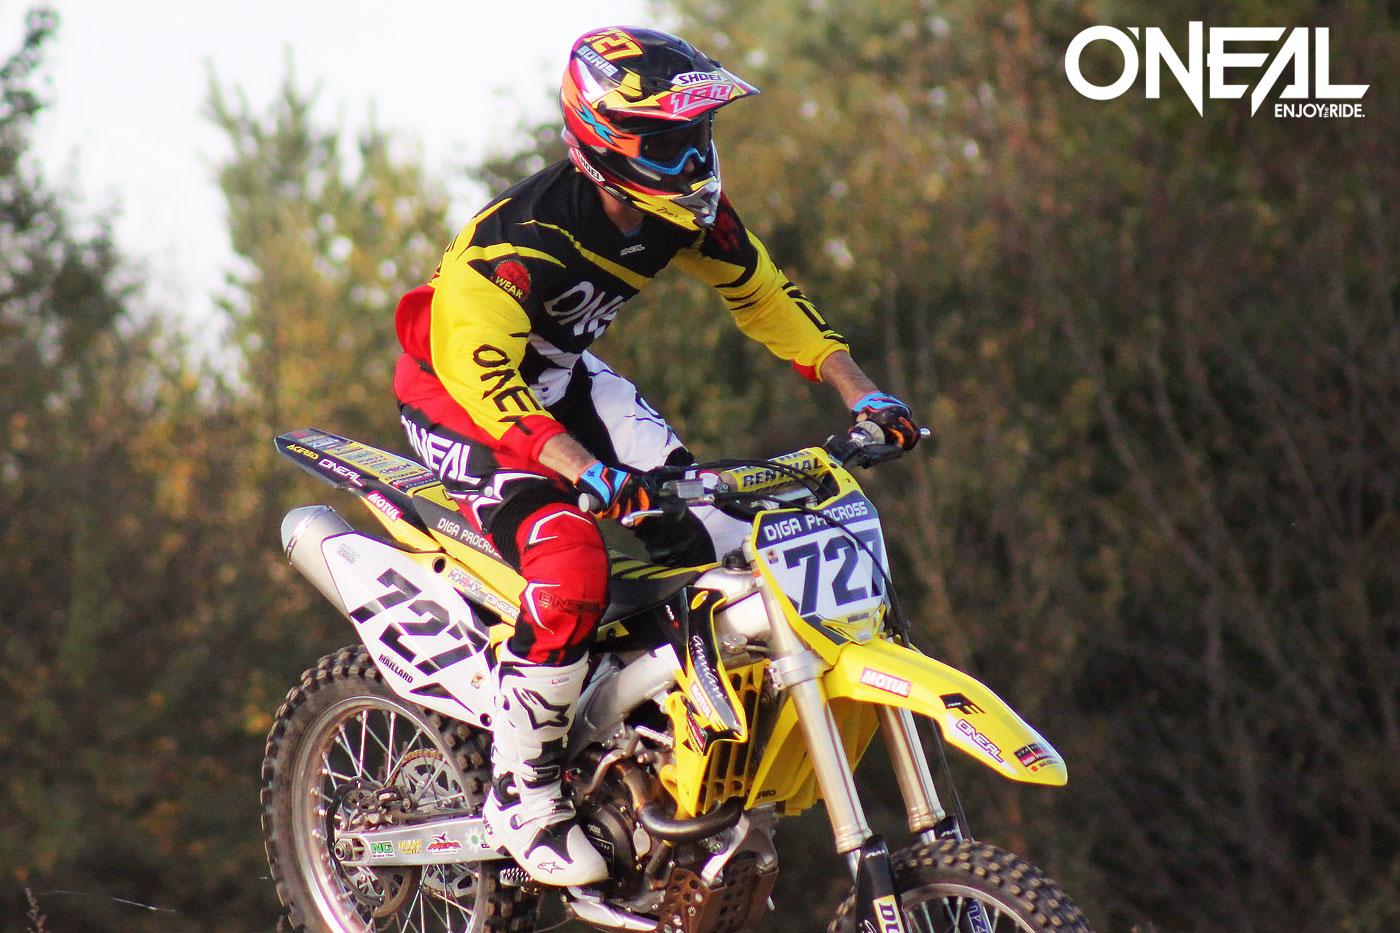 O'Neal Team Rider Boris Maillard